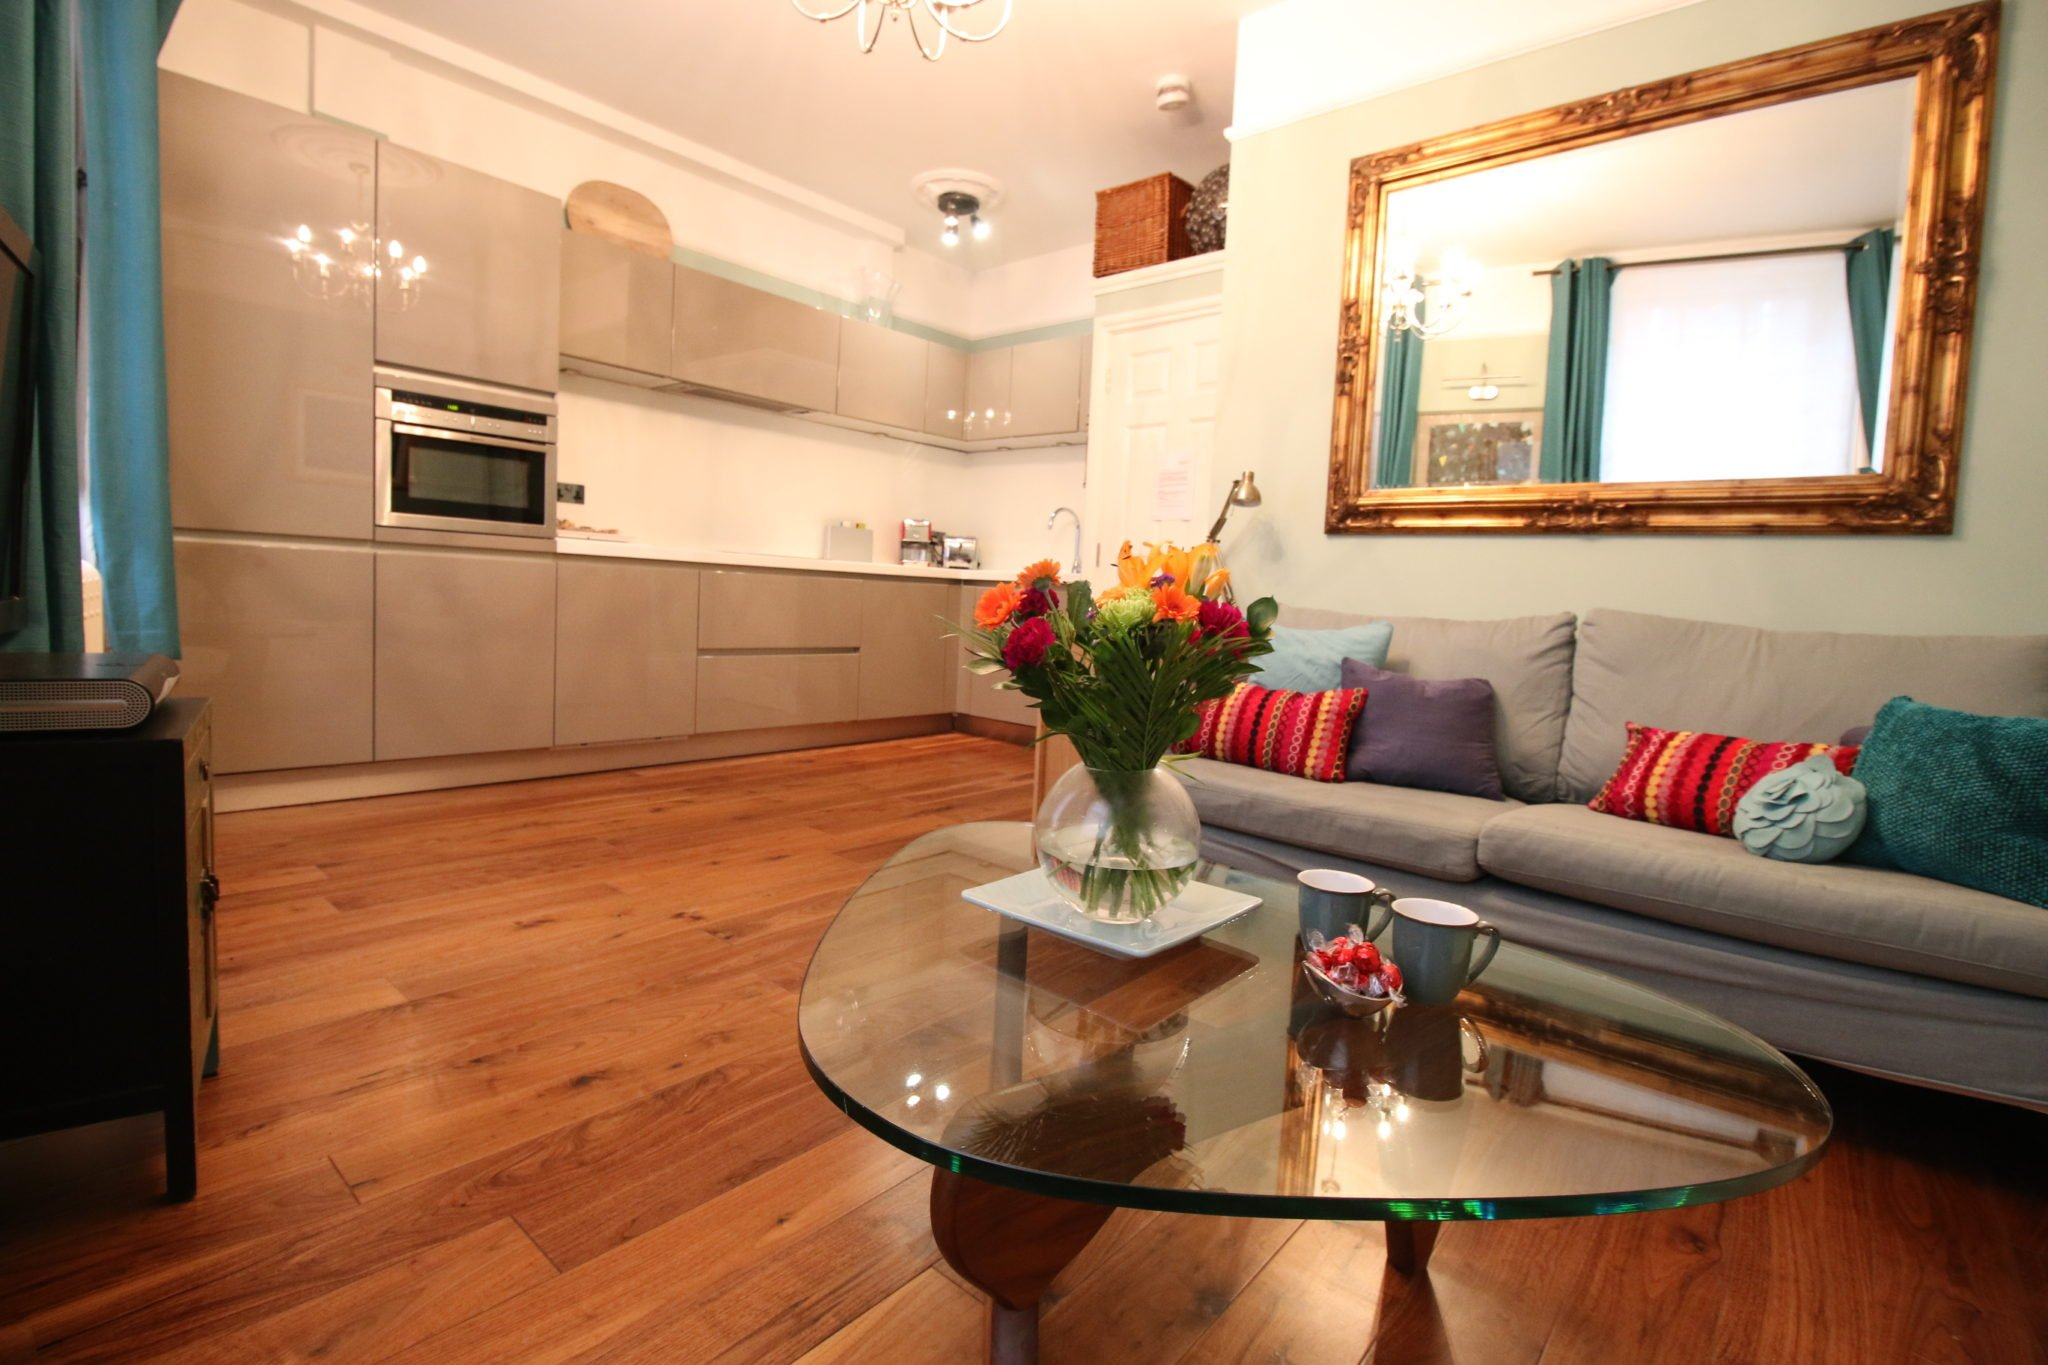 King's-Cross-Accommodation-London---Swinton-Serviced-Apartments-London-near-King's-Cross-|-Urban-Stay